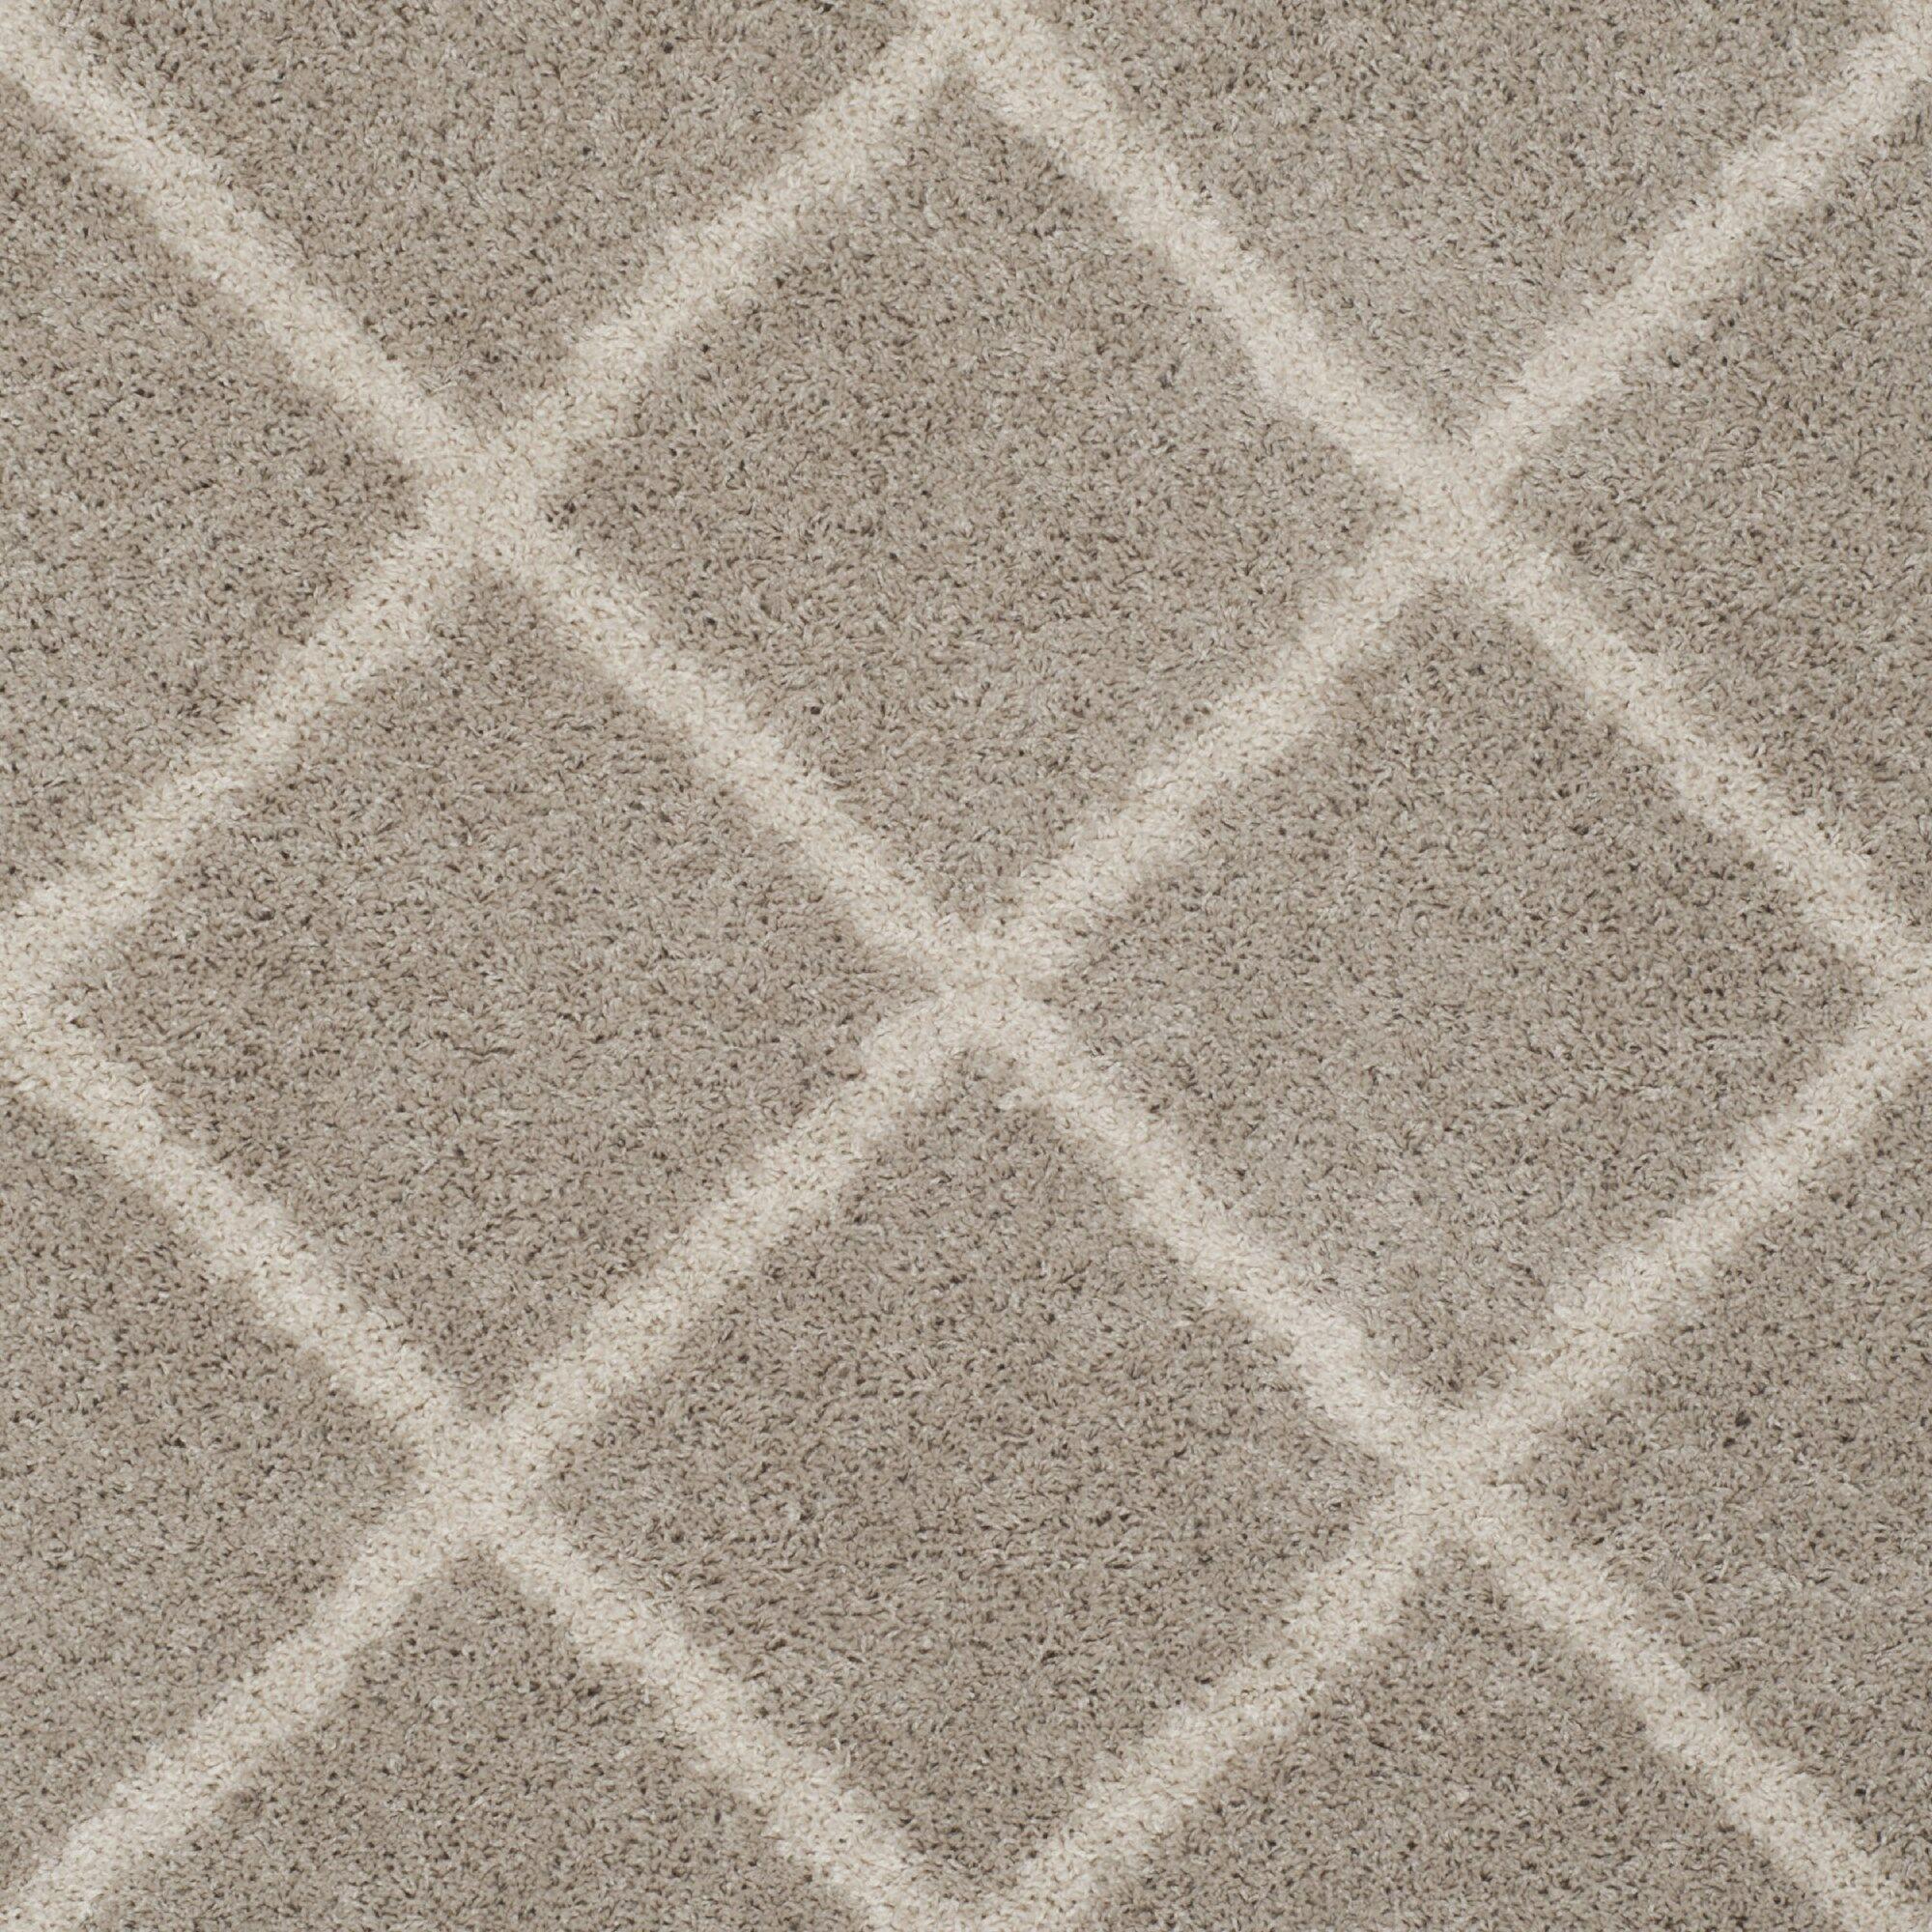 Helsel Light Gray Area Rug Rug Size: Rectangle 5'1